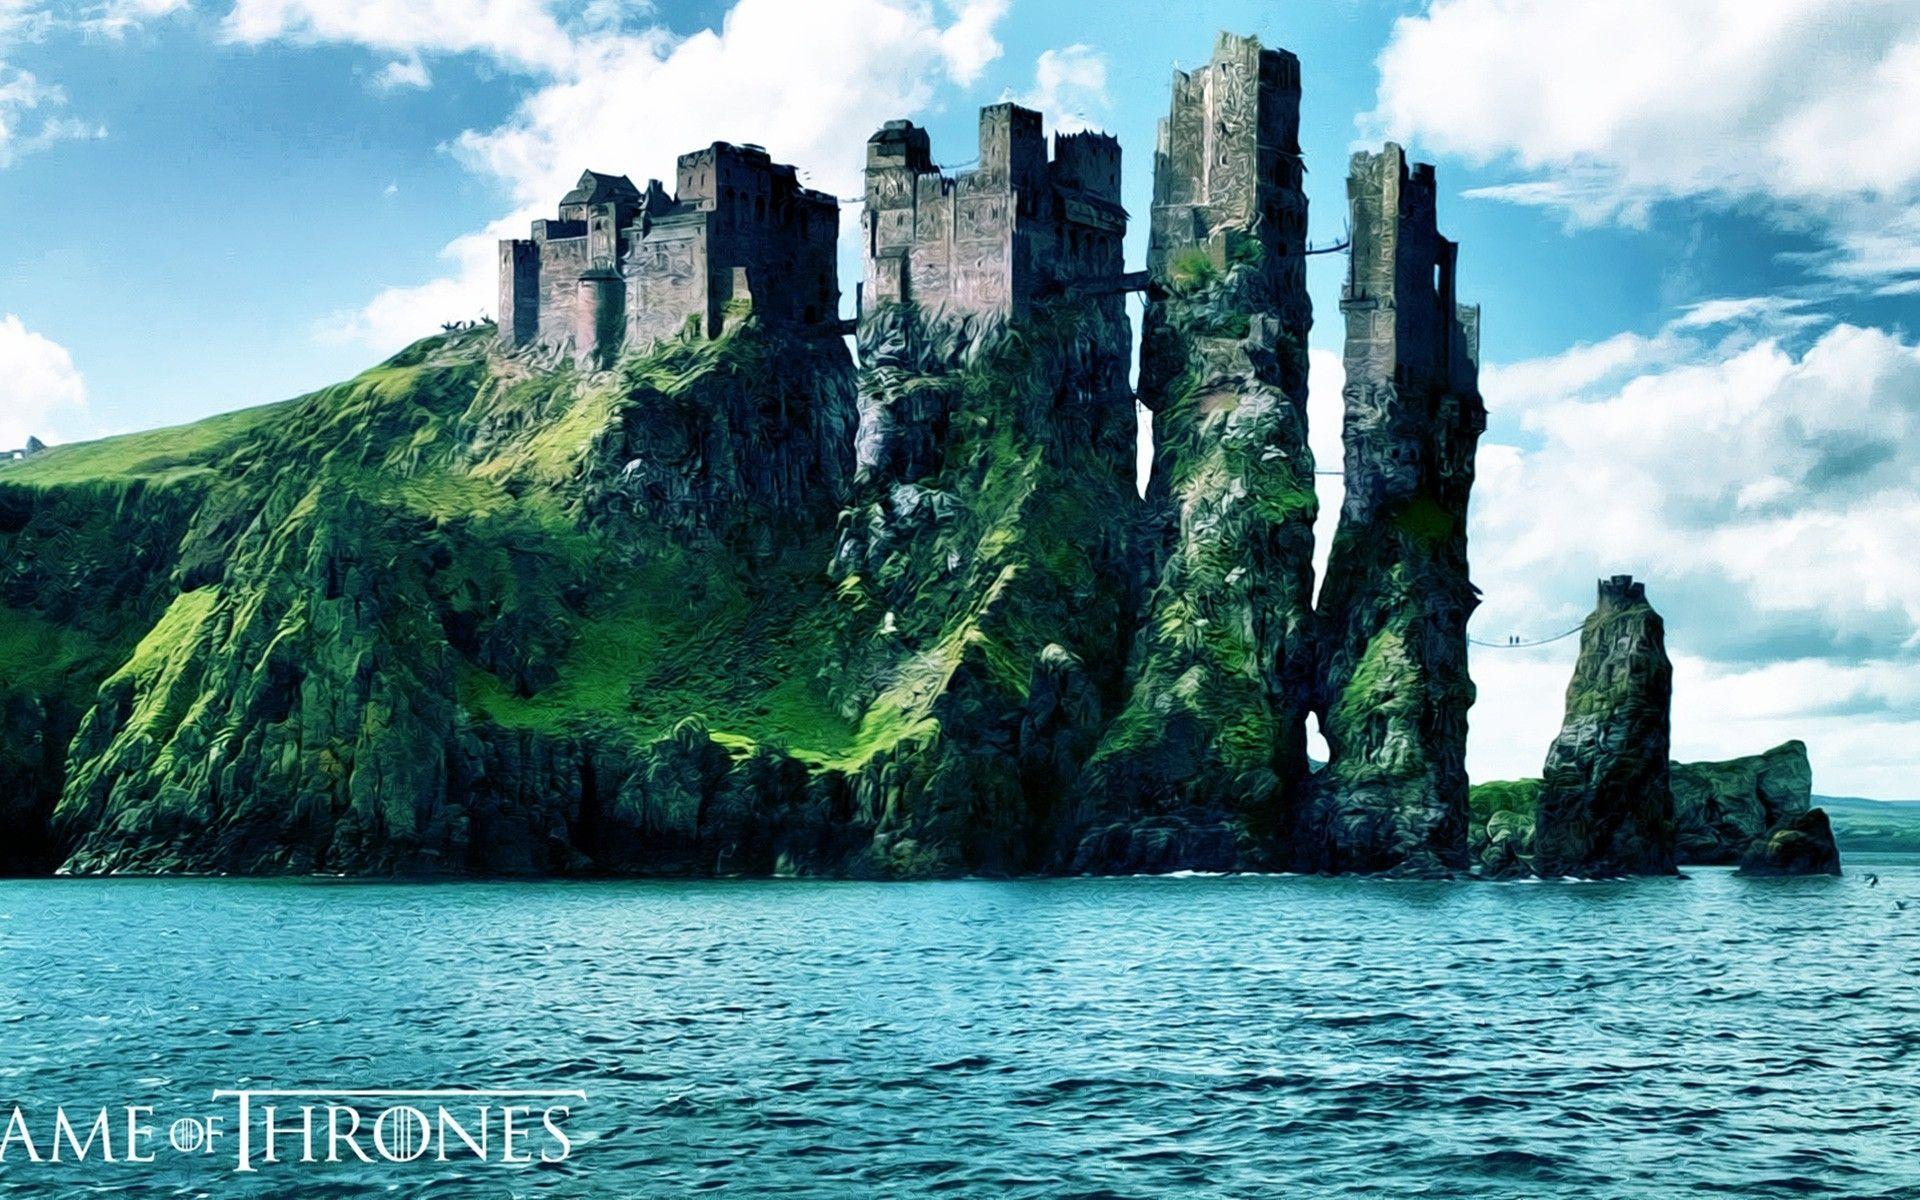 Game of Thrones landscape art